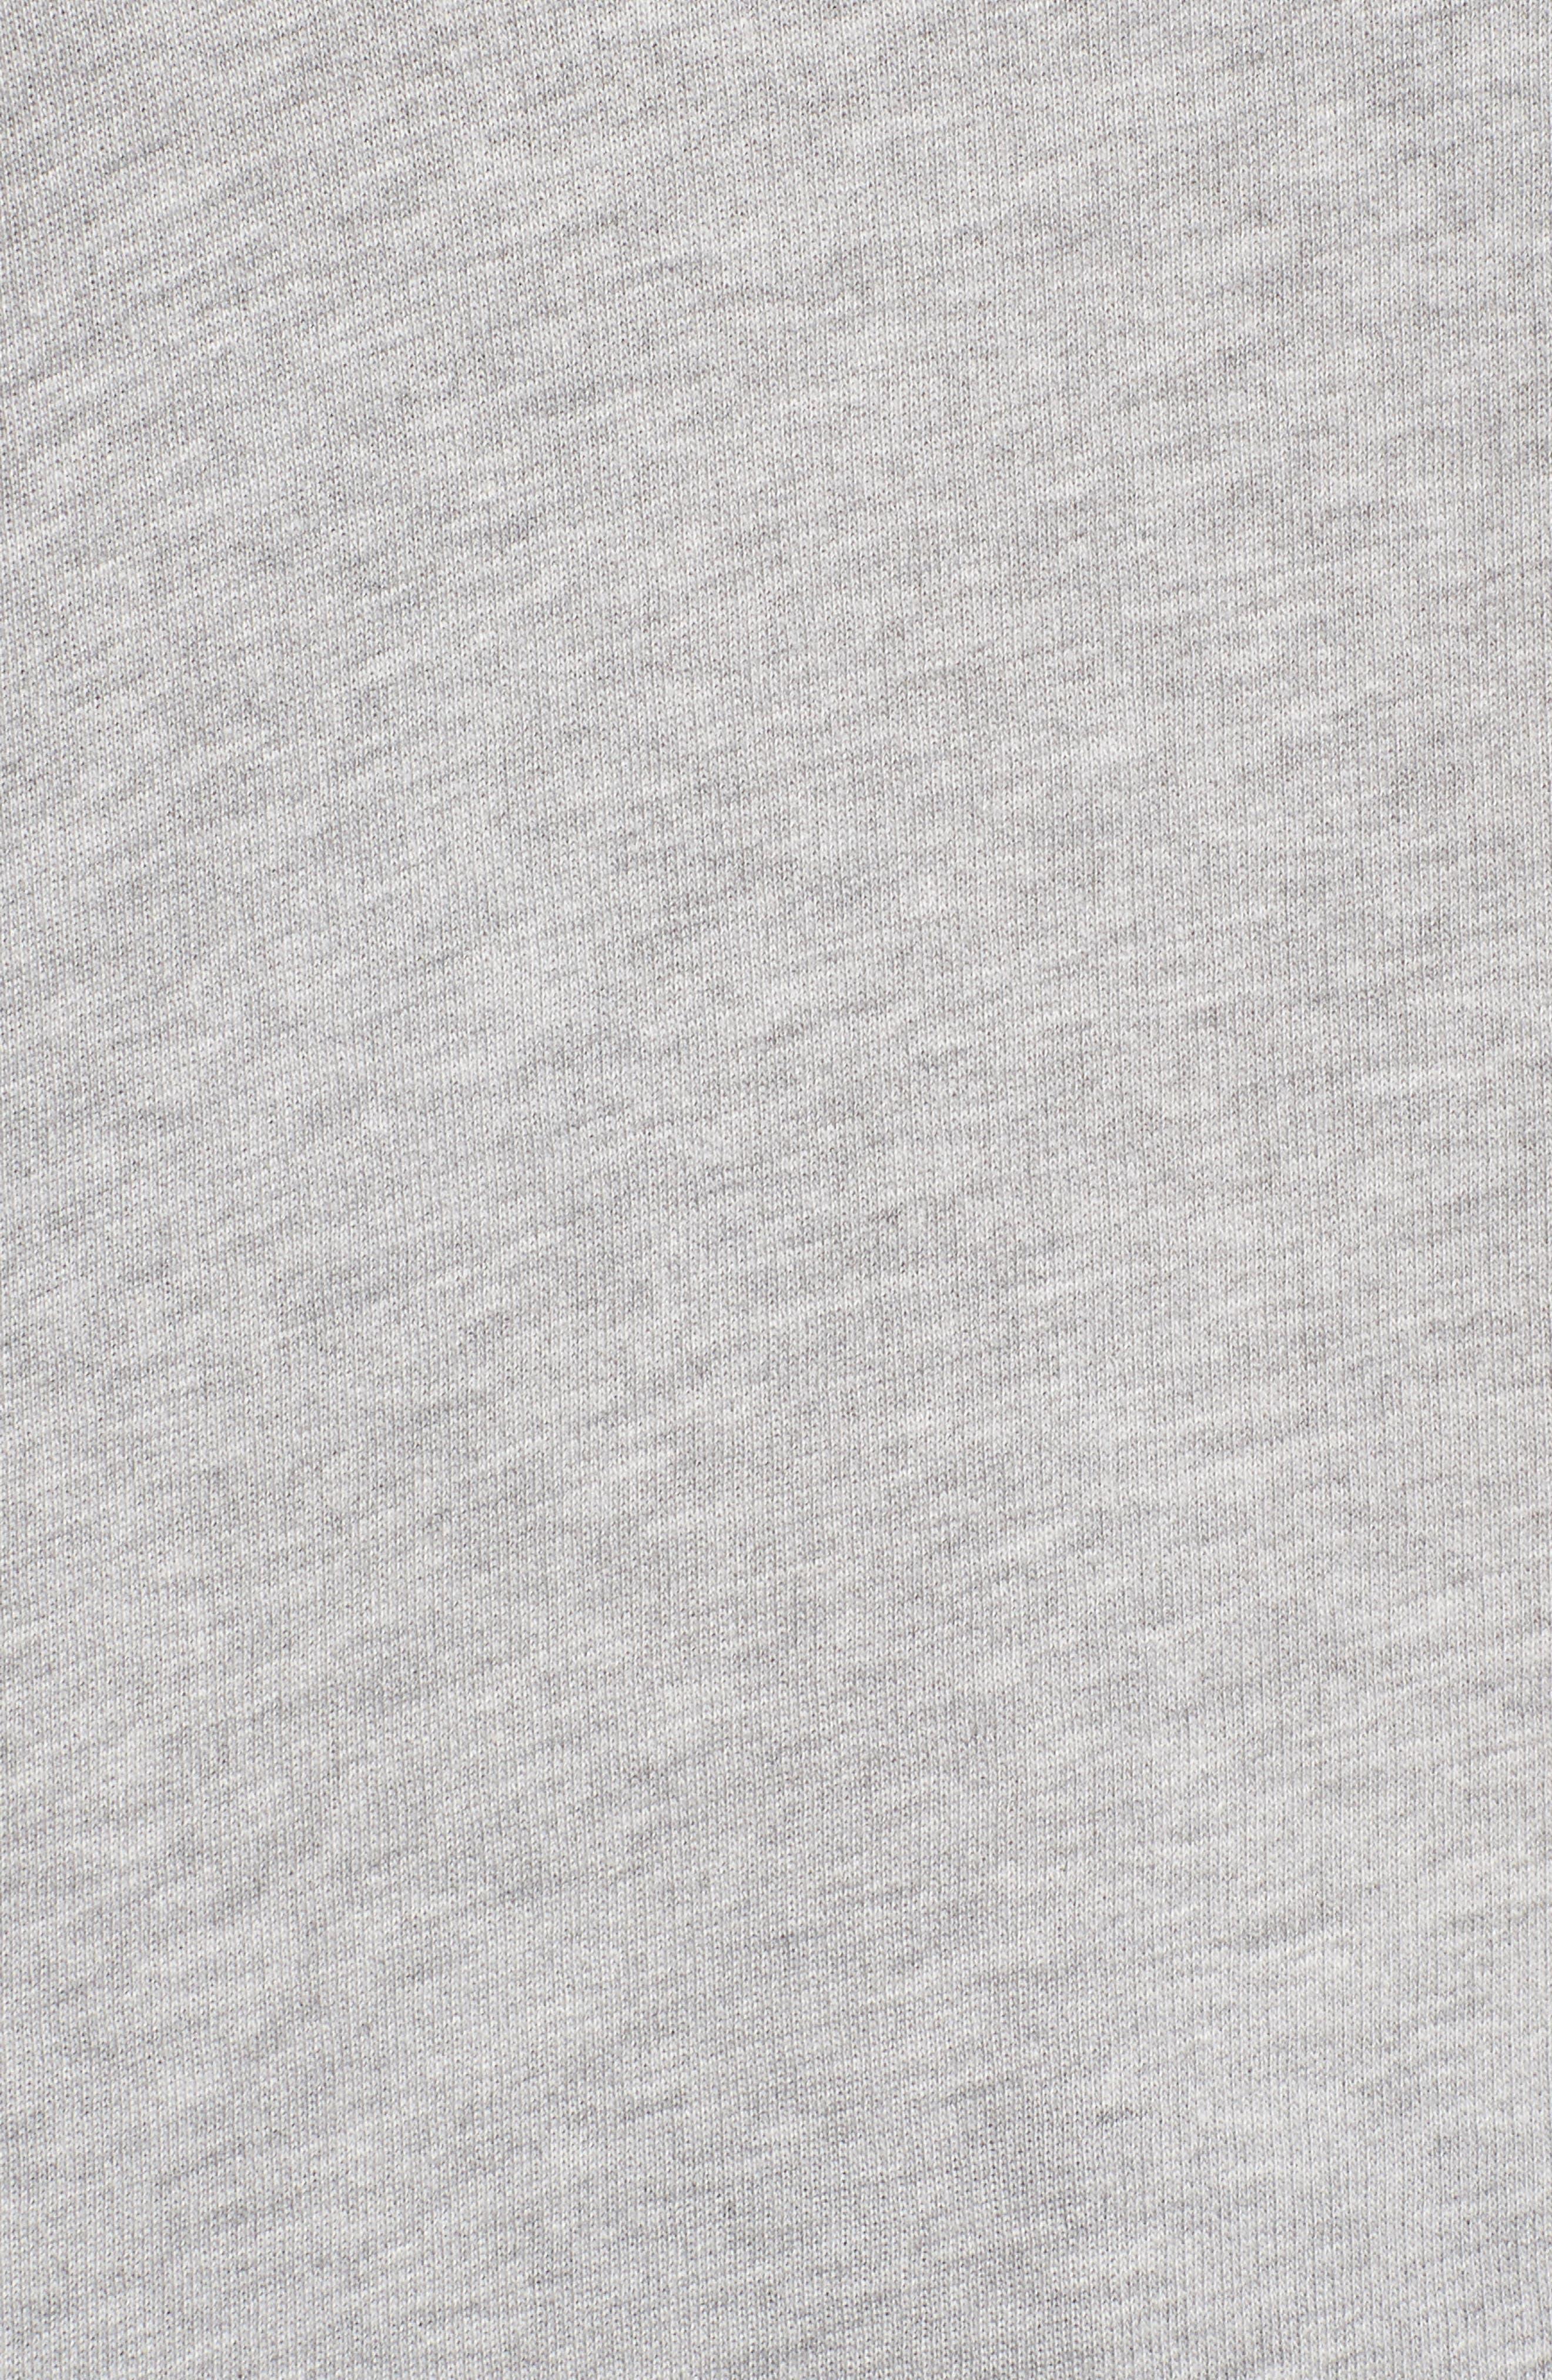 Tie Knot Sweatshirt,                             Alternate thumbnail 10, color,